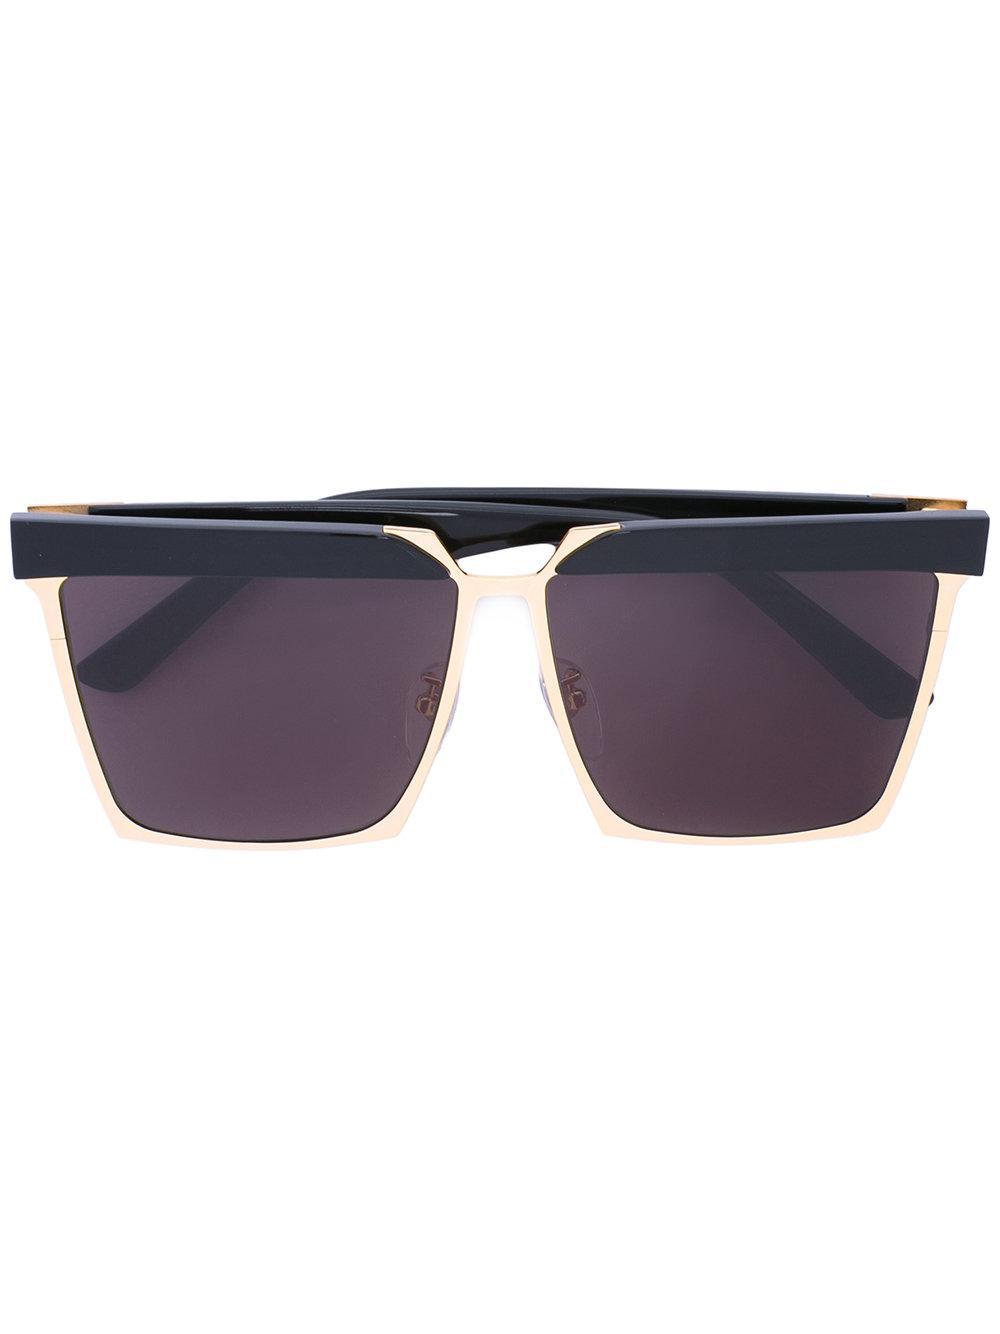 Irresistor 'rave' Sunglasses In Black